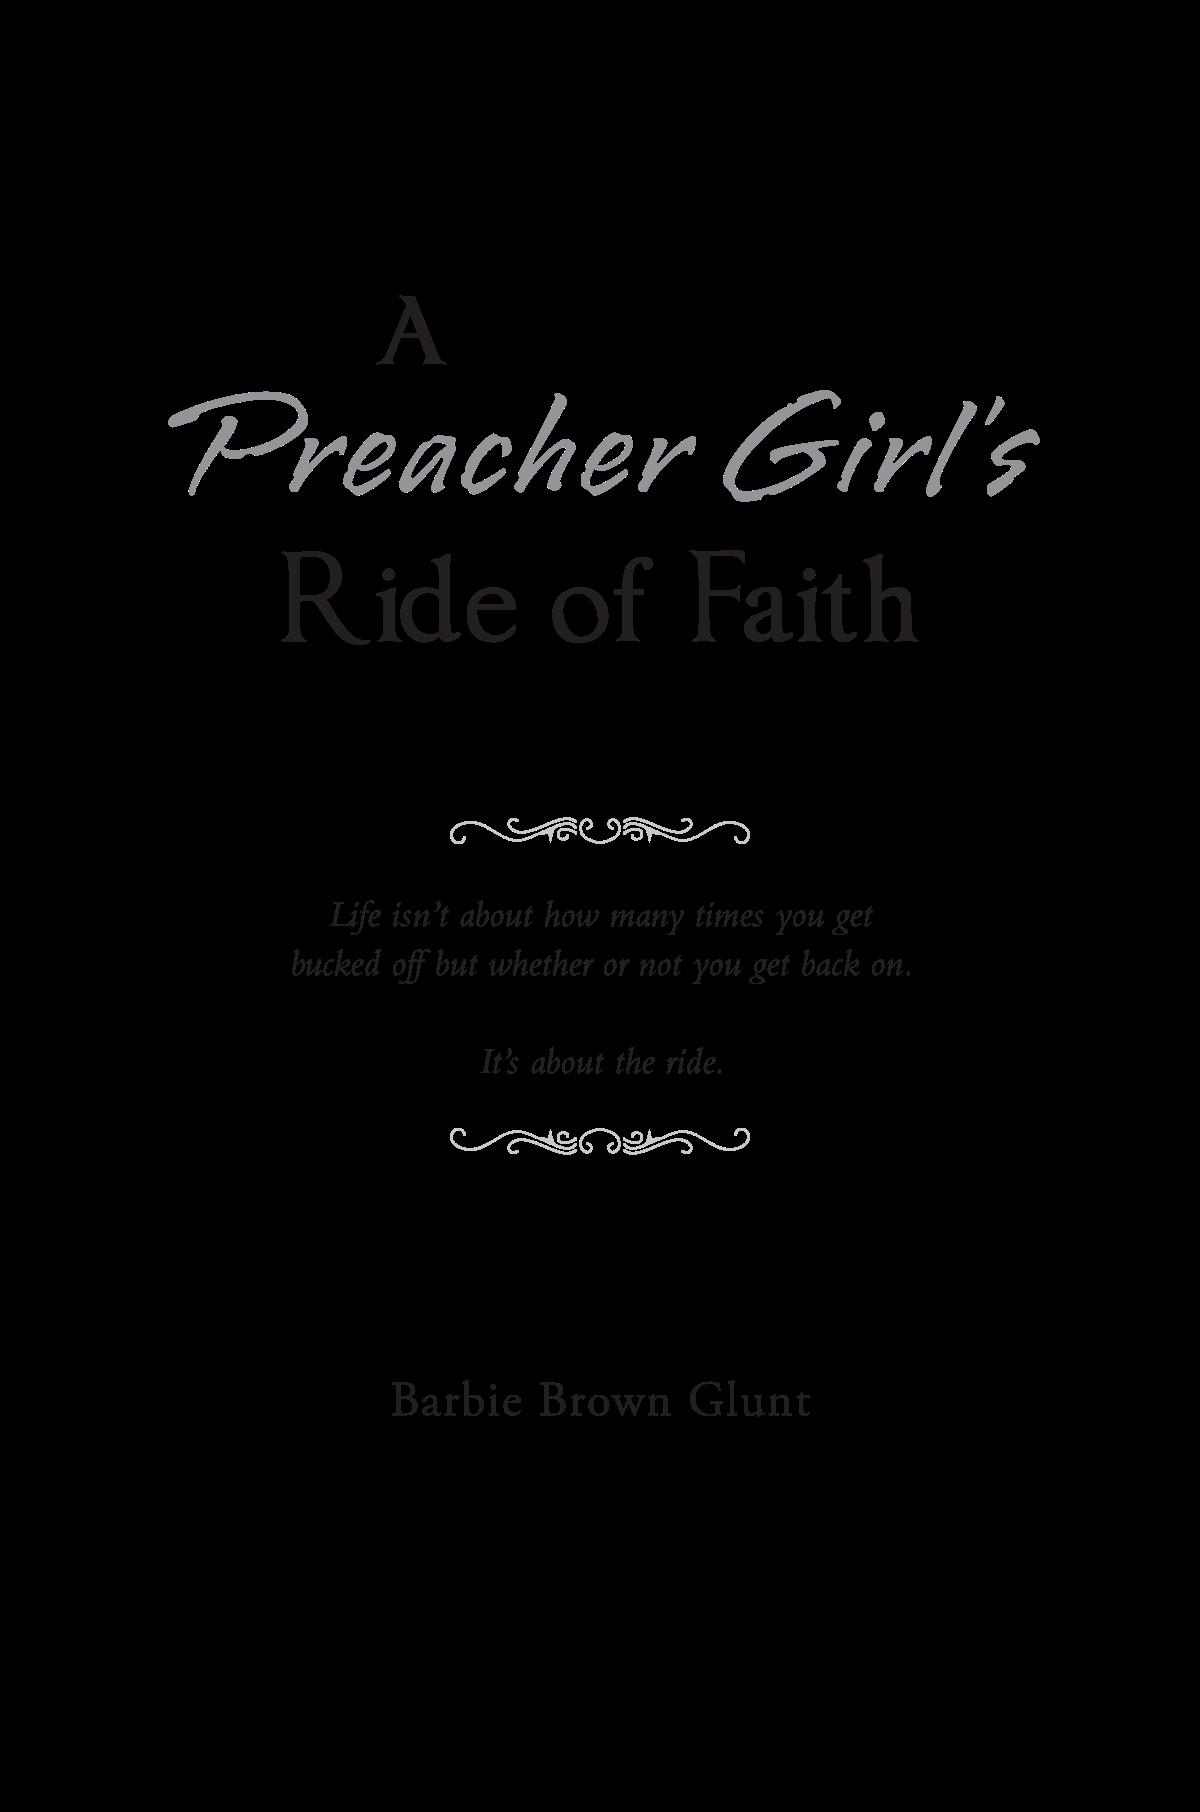 A Preacher Girls Ride of Faith